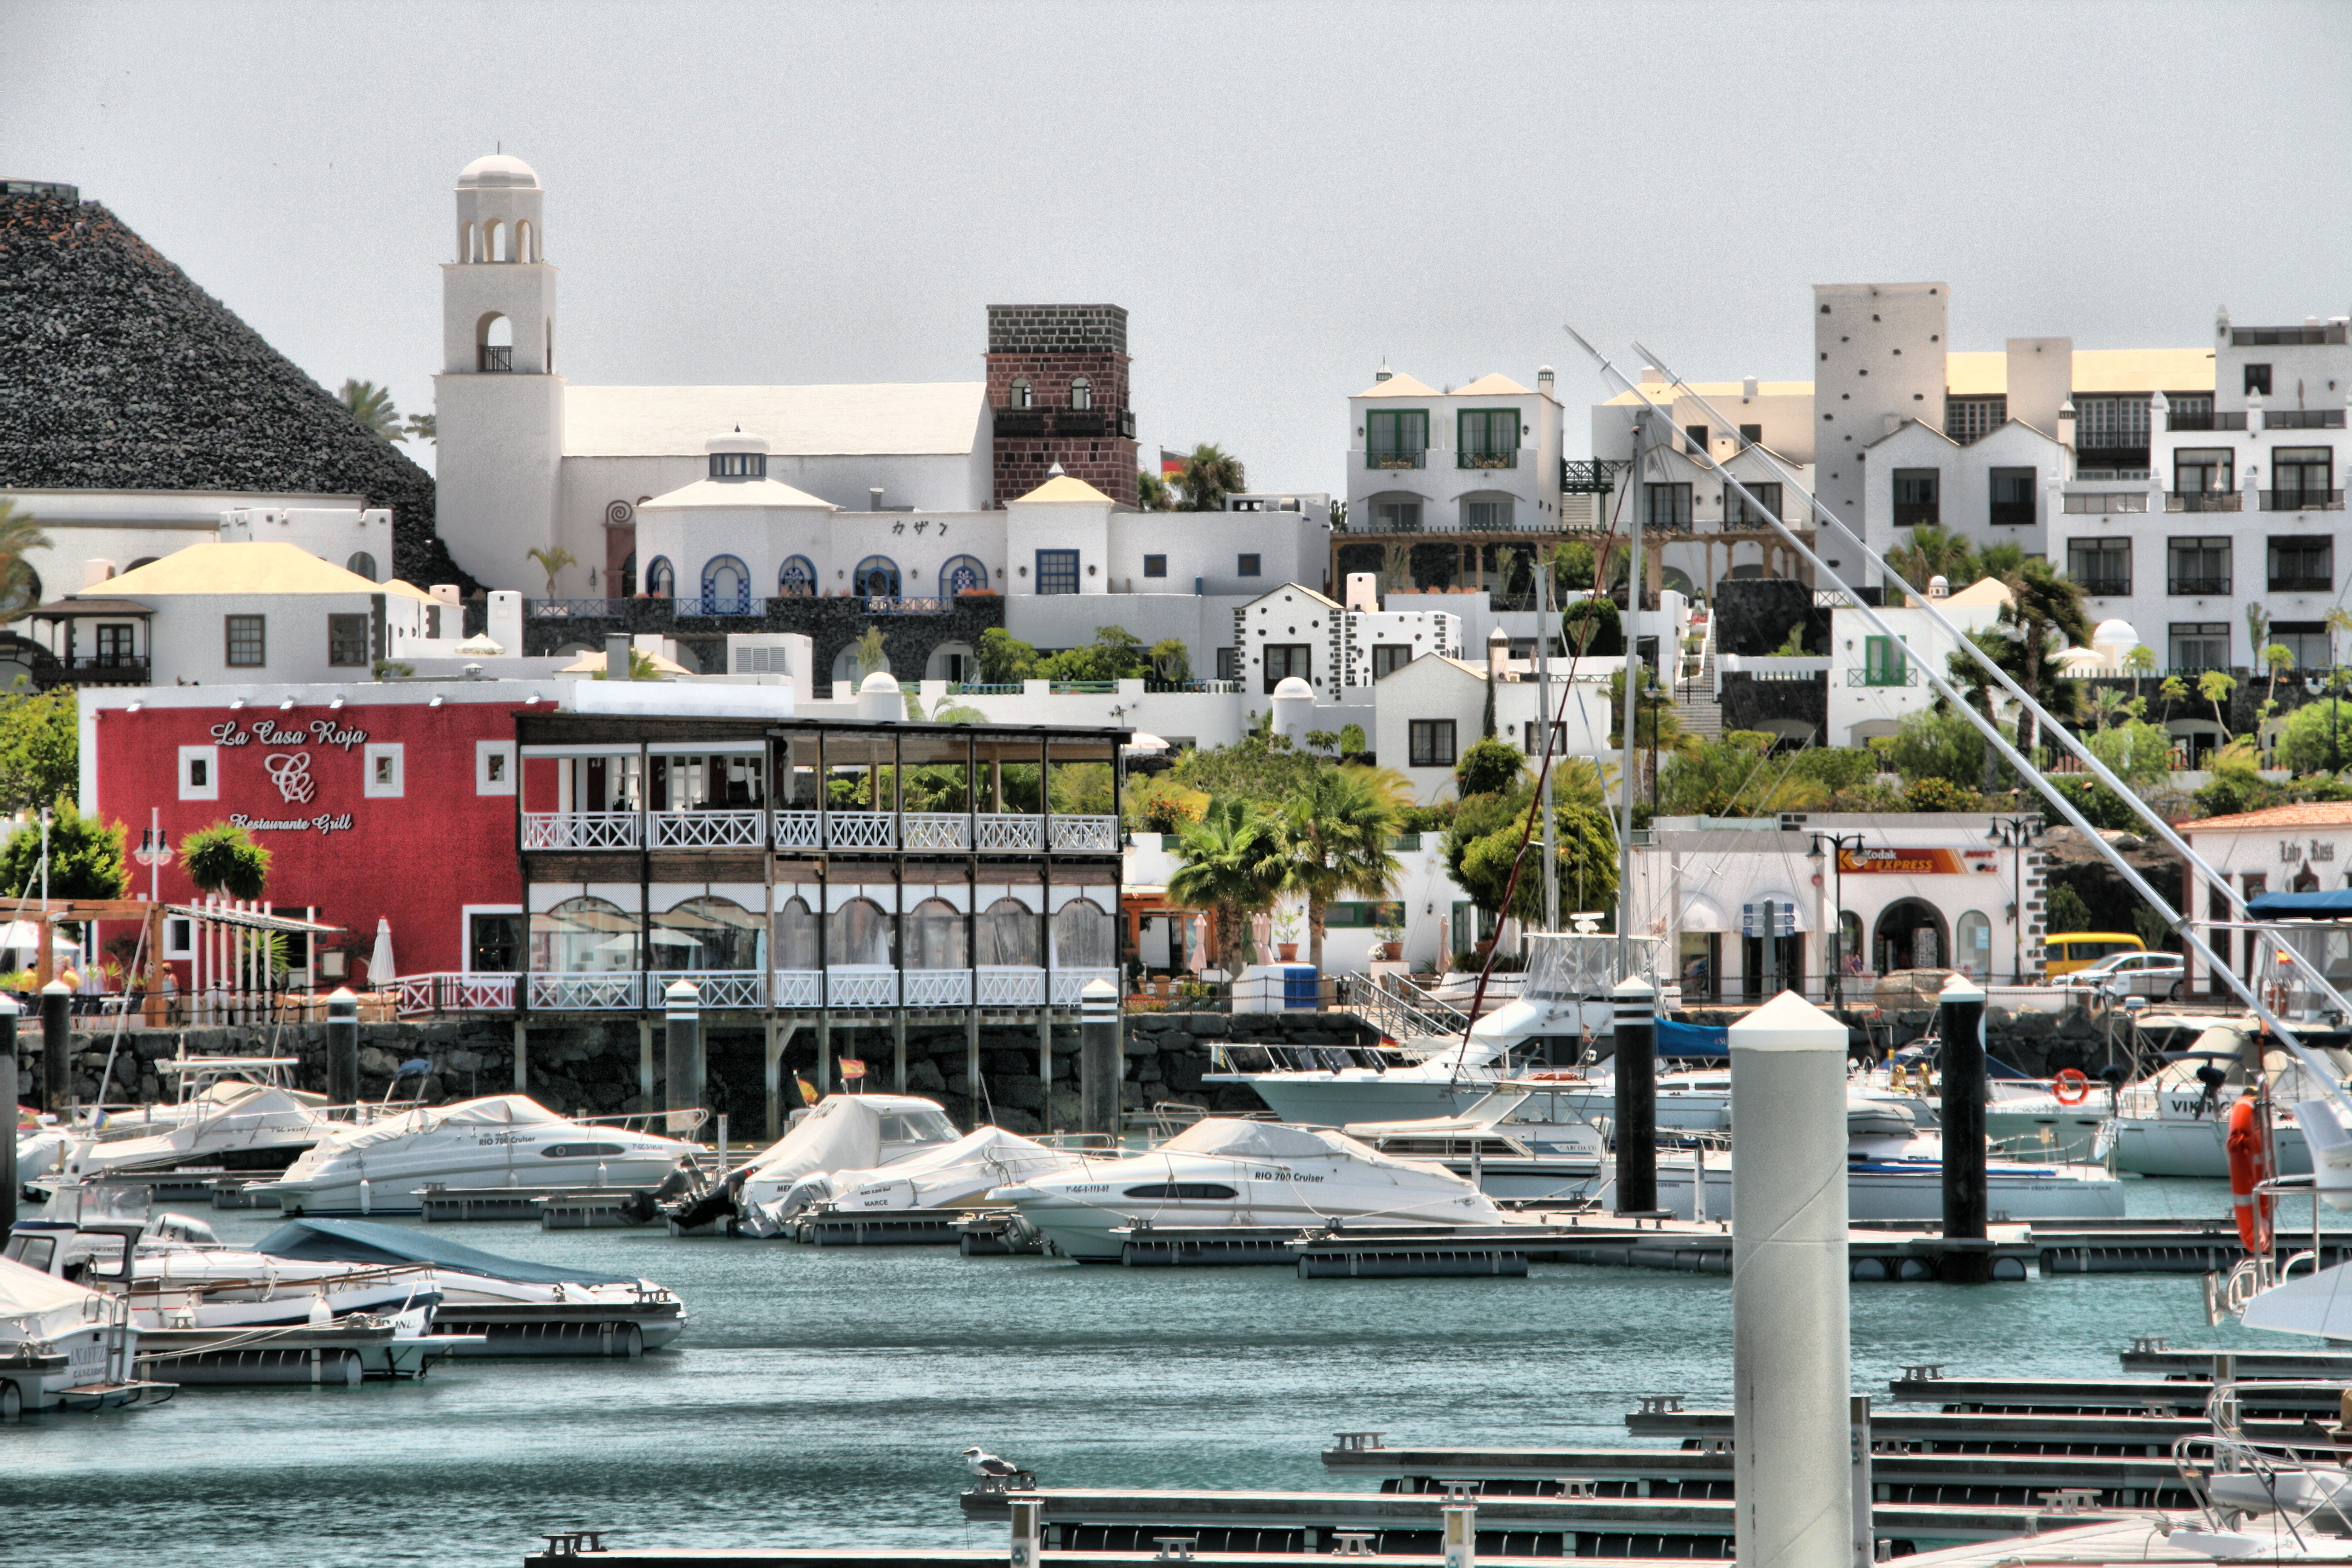 File:Rubicon Marina, Playa Blanca, Lanzarote, Canary Islands (2666979377).jpg